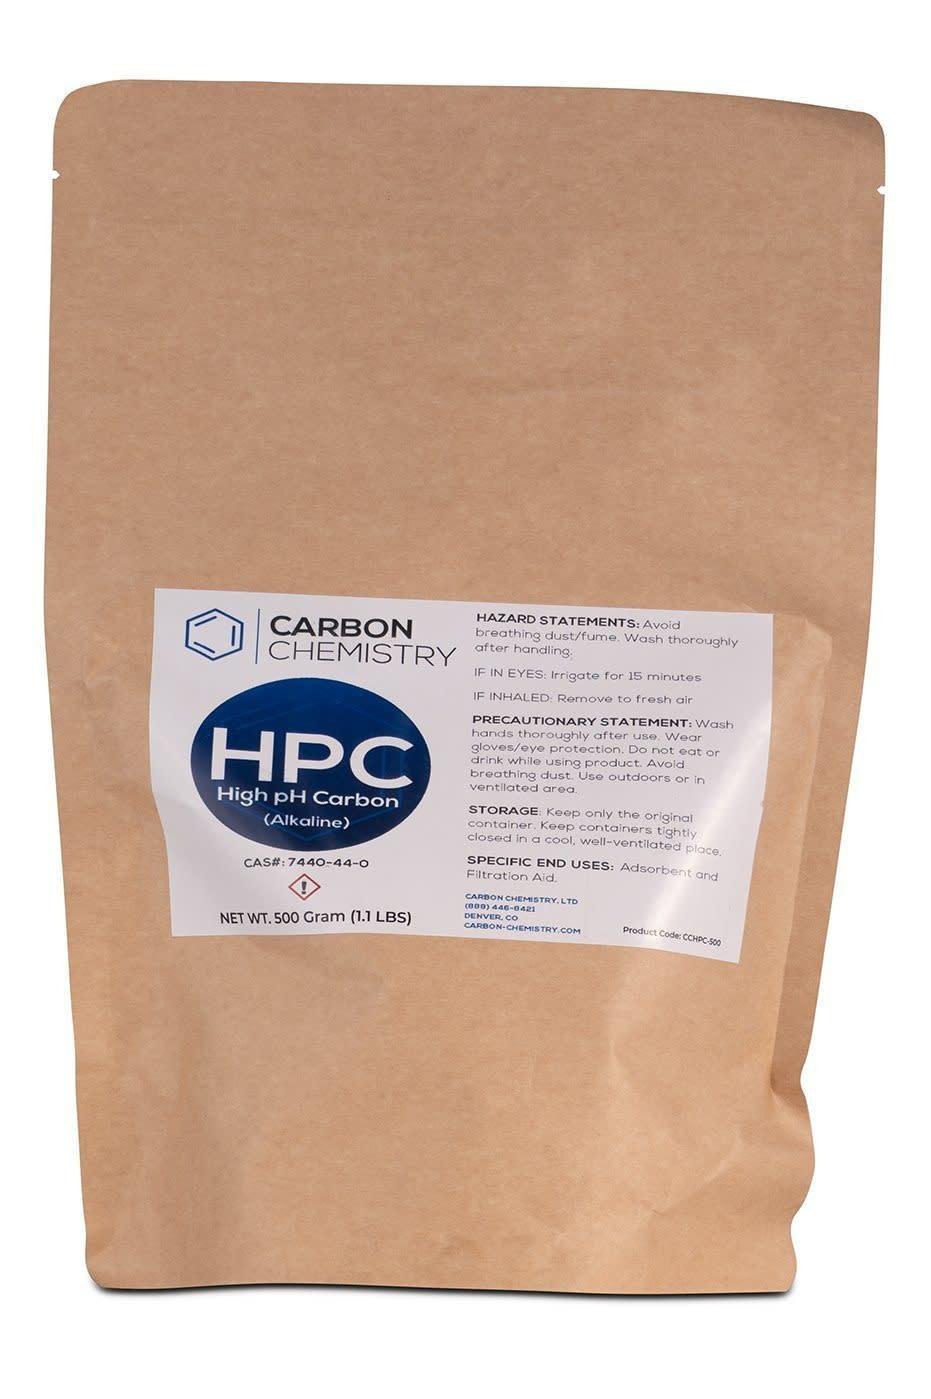 Carbon Chemistry Carbon Chemistry - High pH Carbon